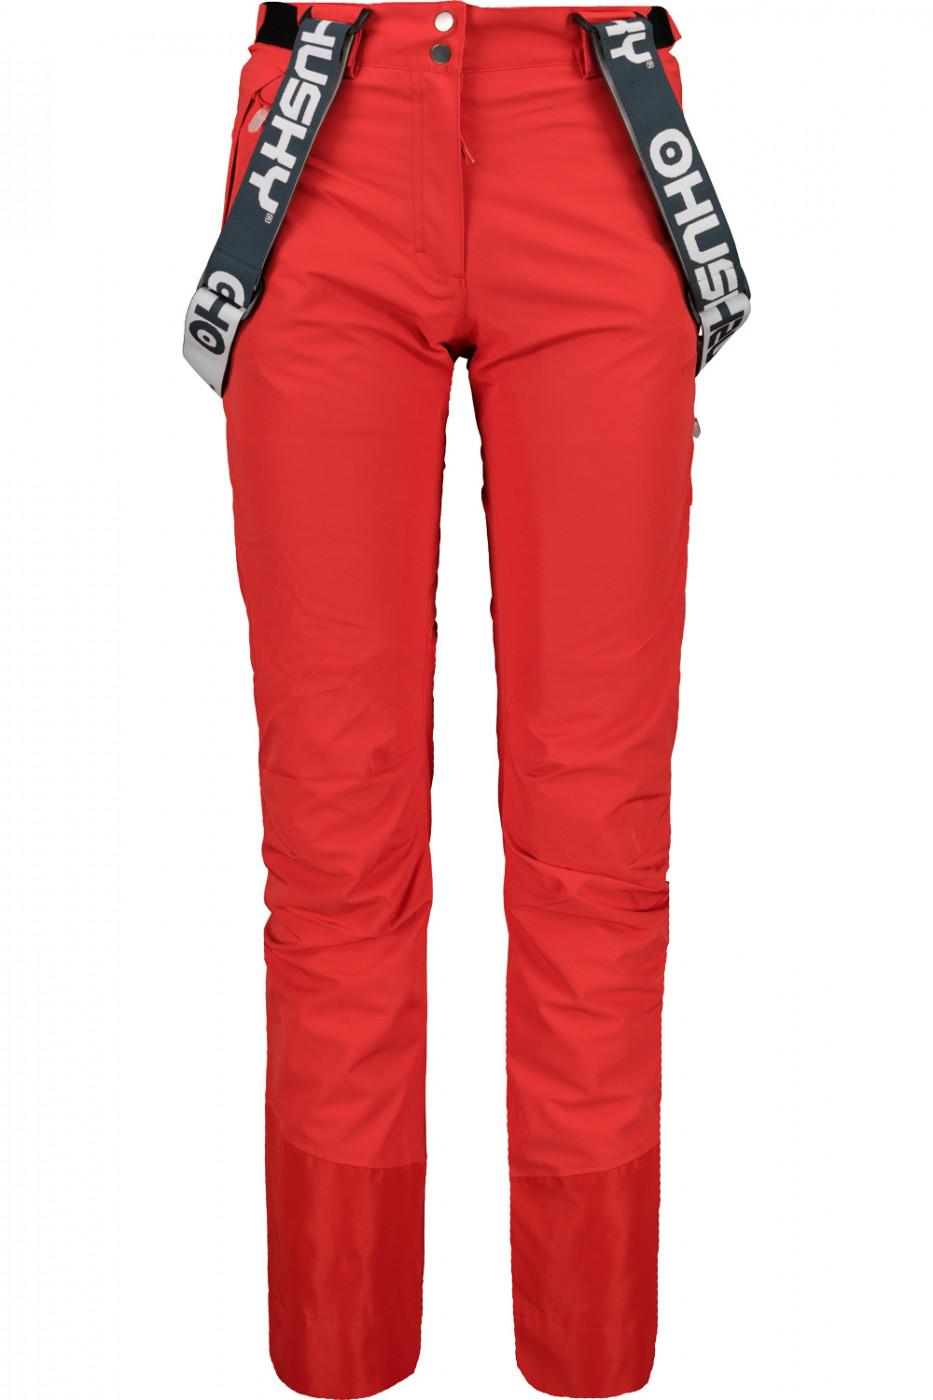 Nohavice lyžiarske dámske HUSKY MITALY L